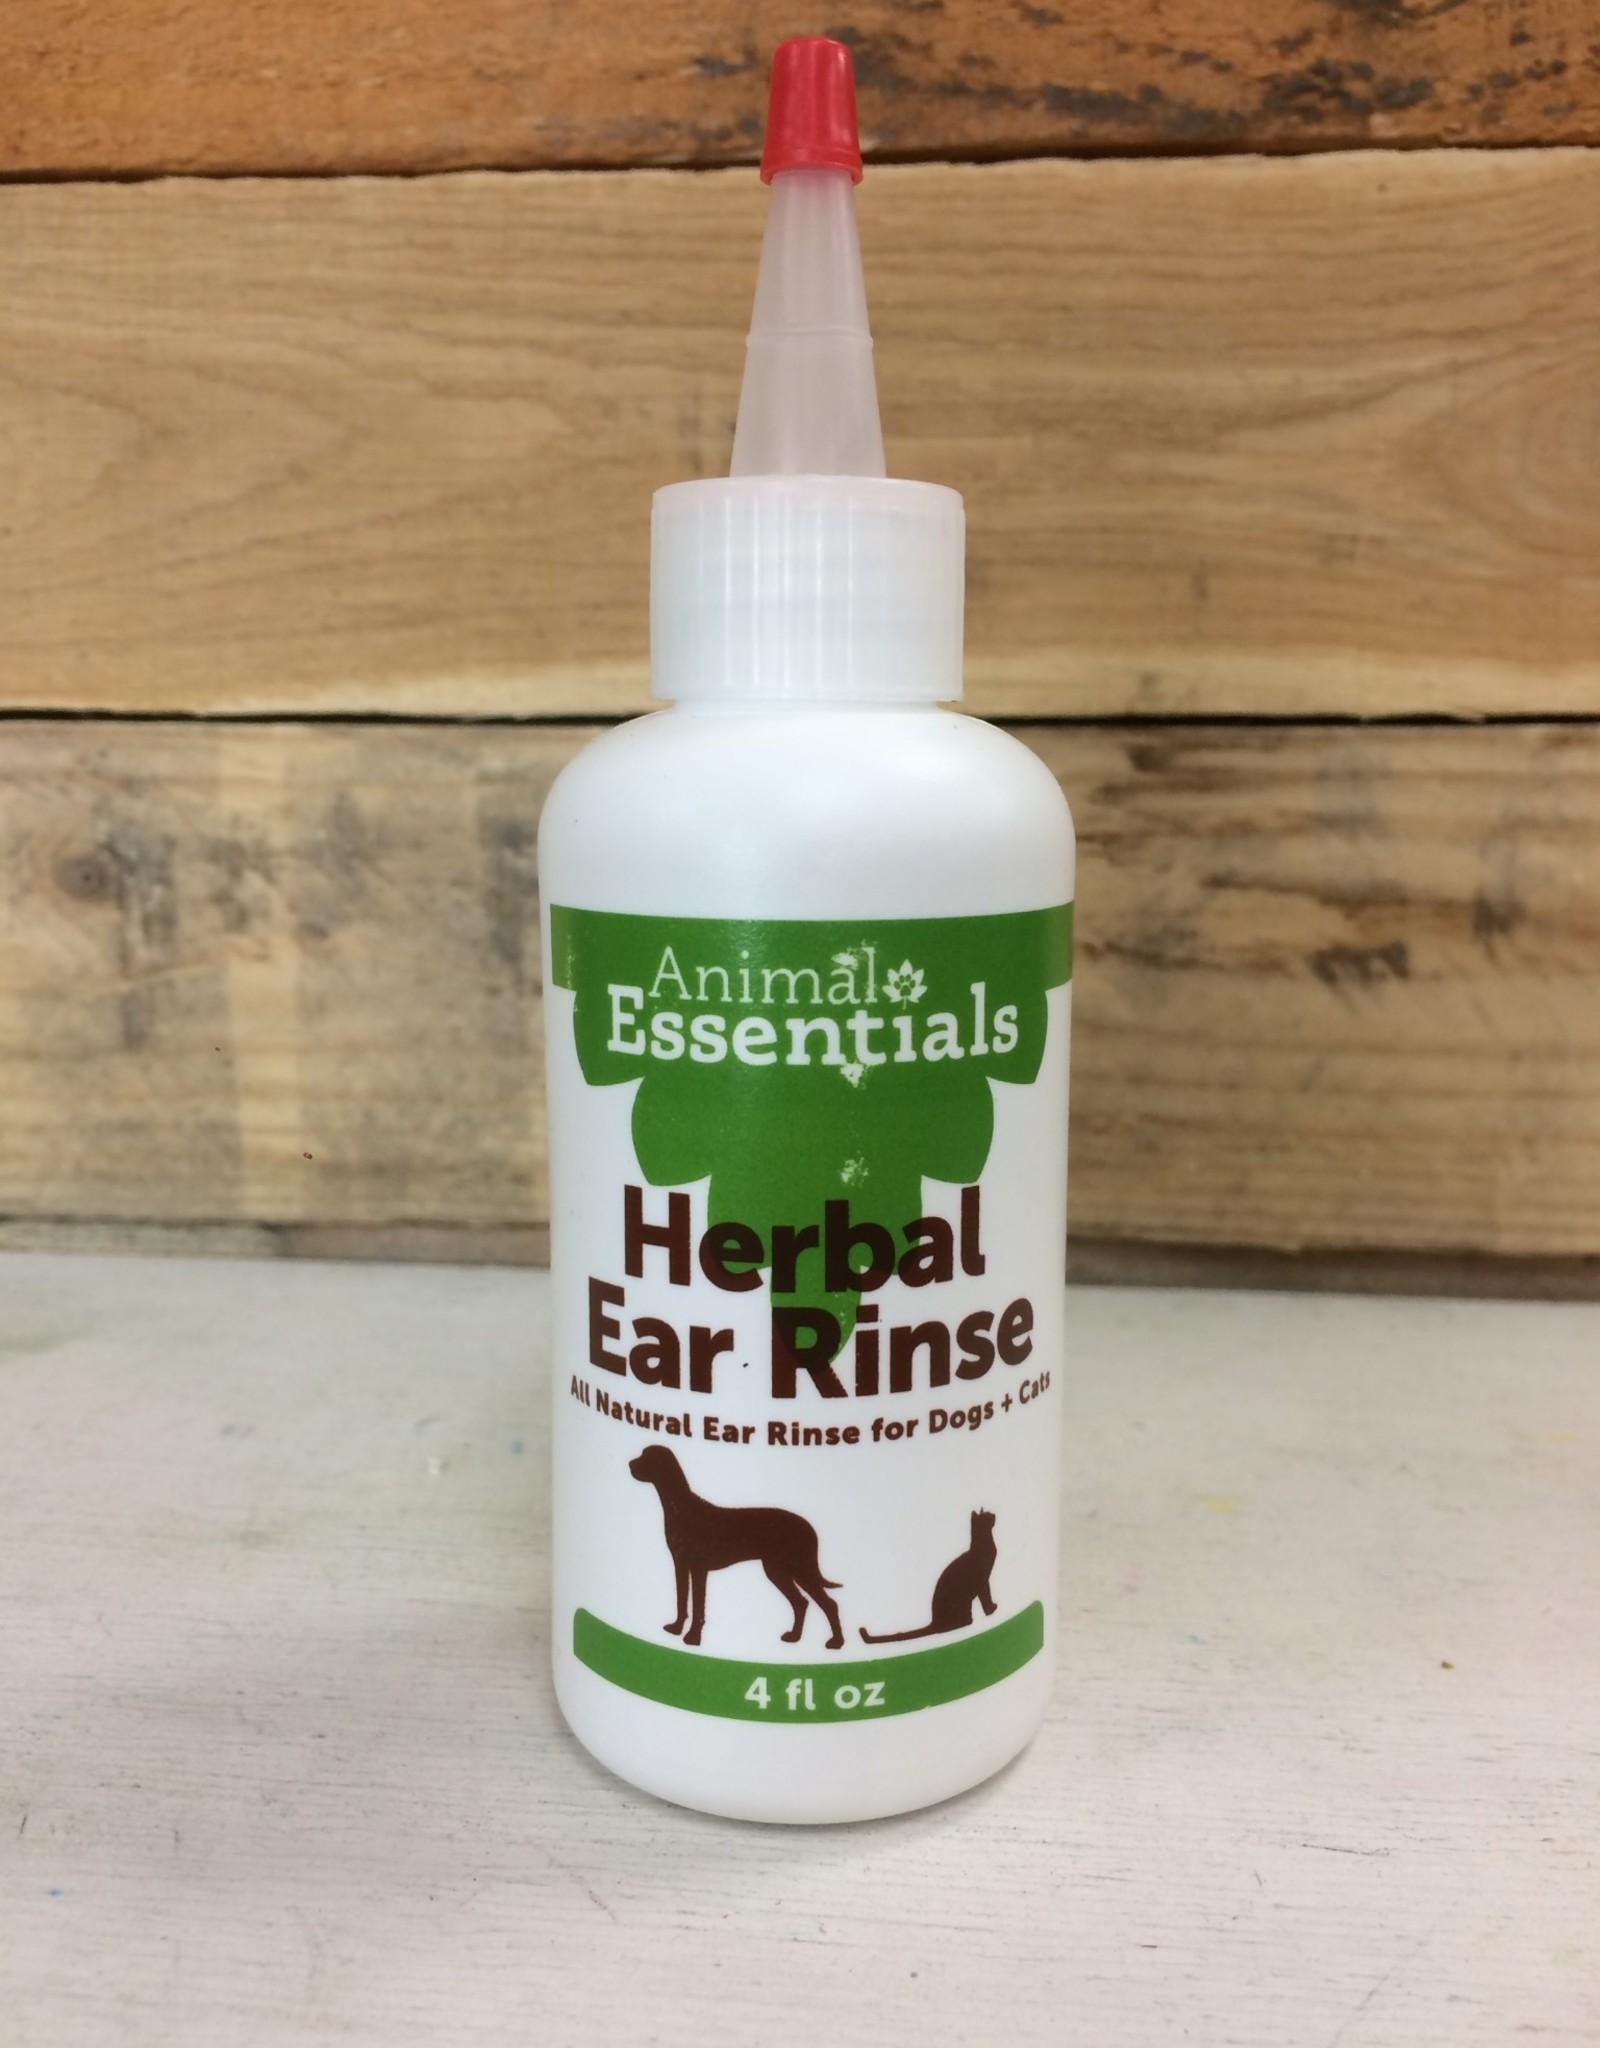 Animal Essentials Animal essentials 4oz herbal rinse ear cleaner